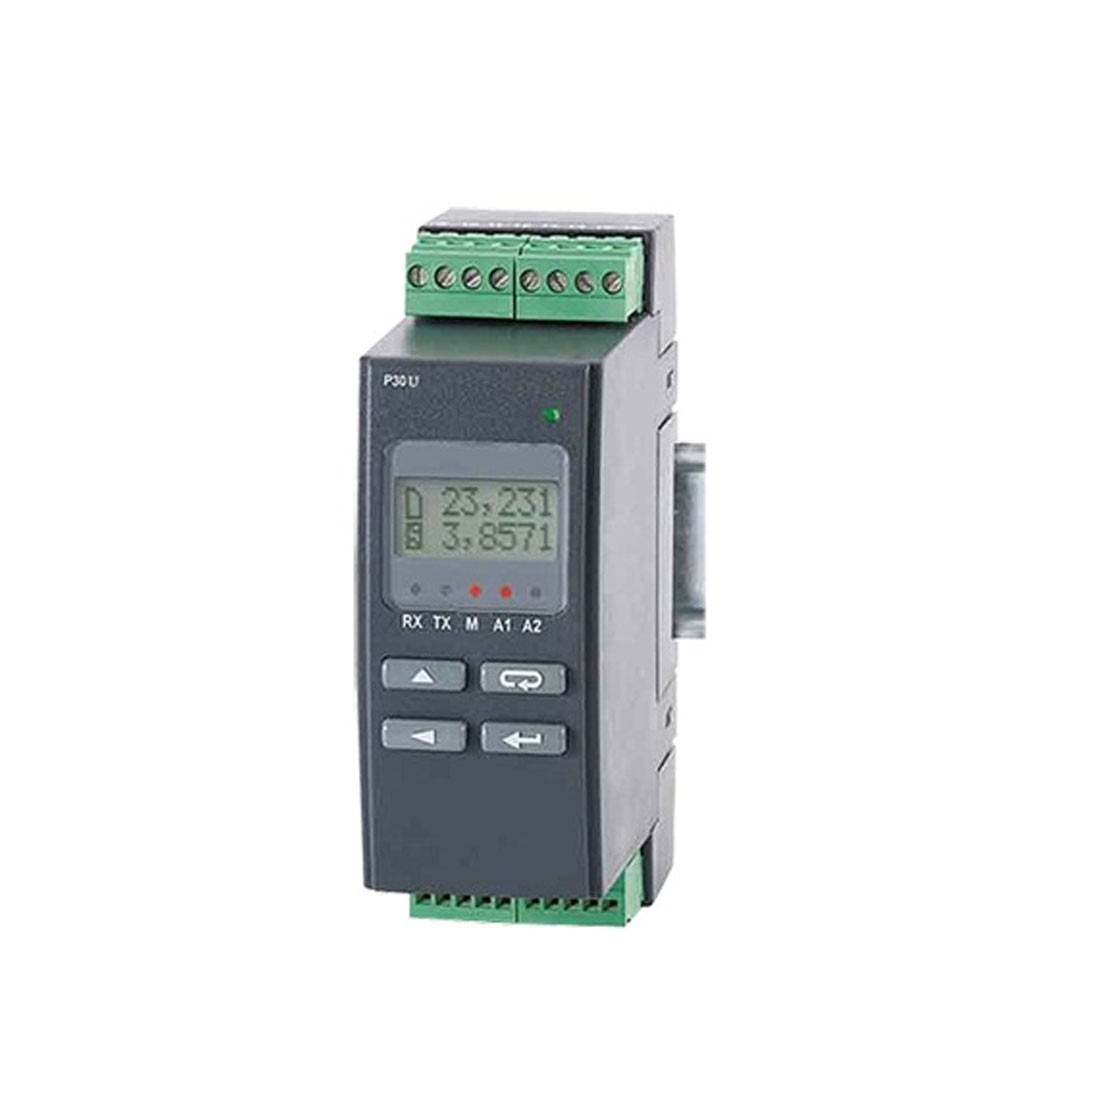 P30U Temperature Transducer (Voltage, Current, and Resistance)